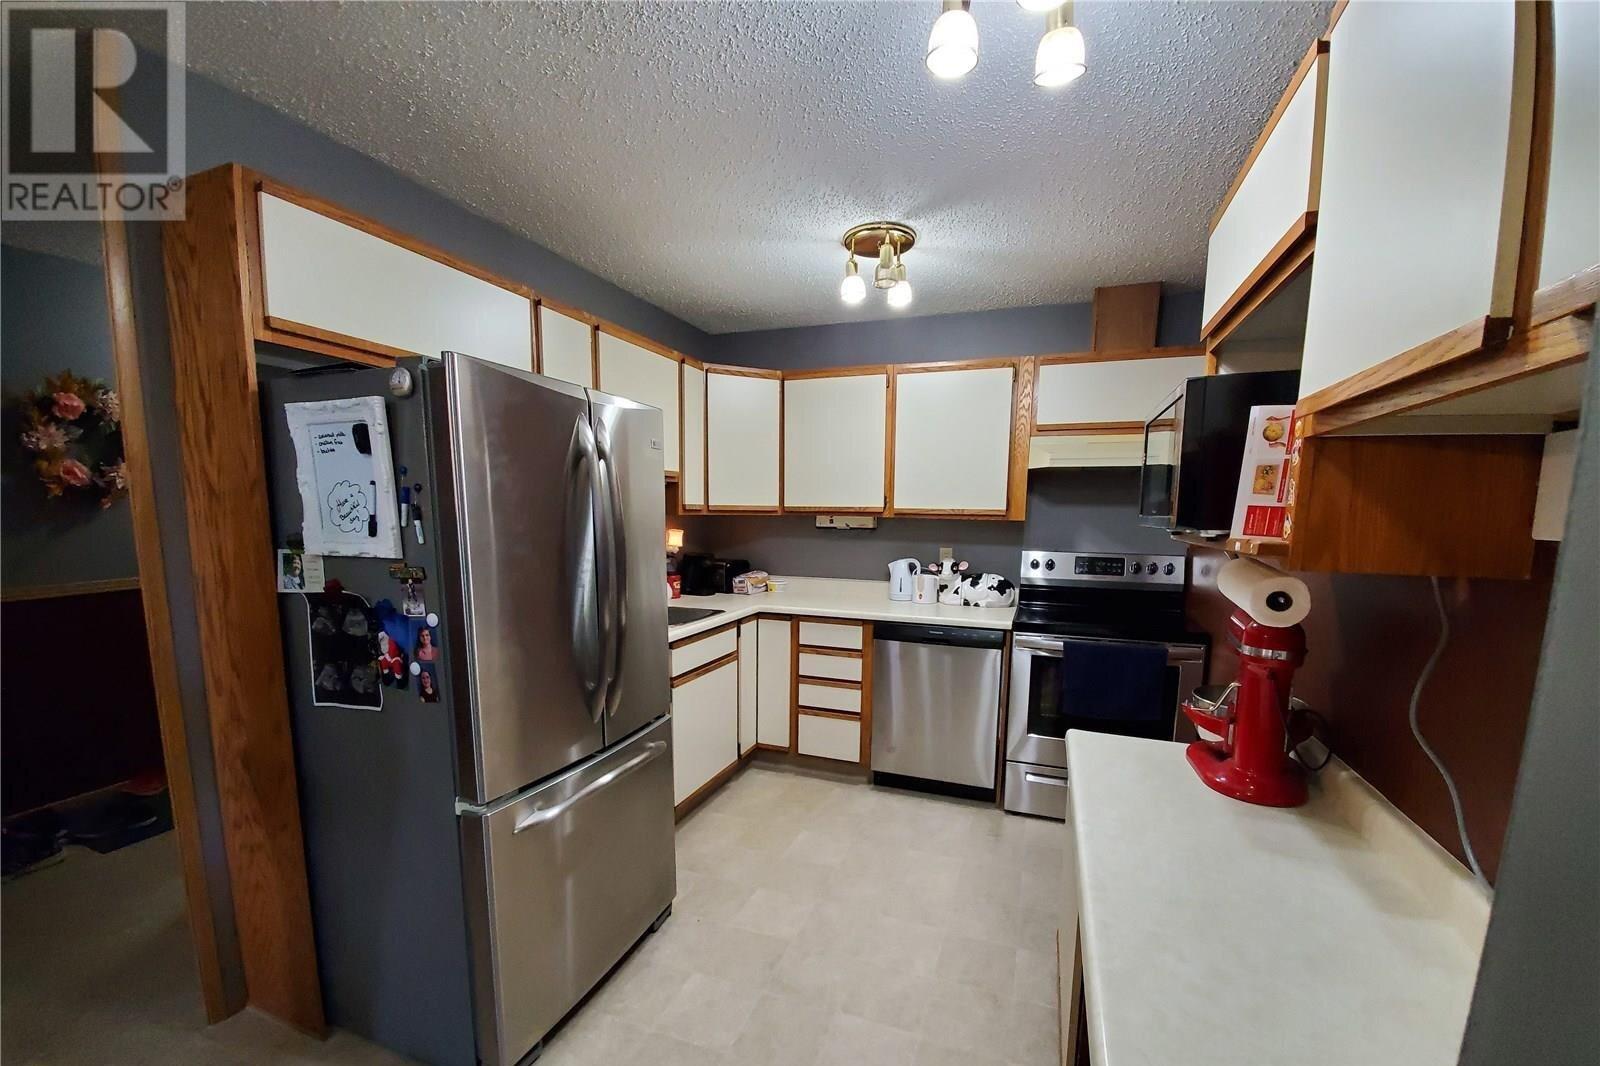 Condo for sale at 1001 Main St Unit 202 Saskatoon Saskatchewan - MLS: SK831367